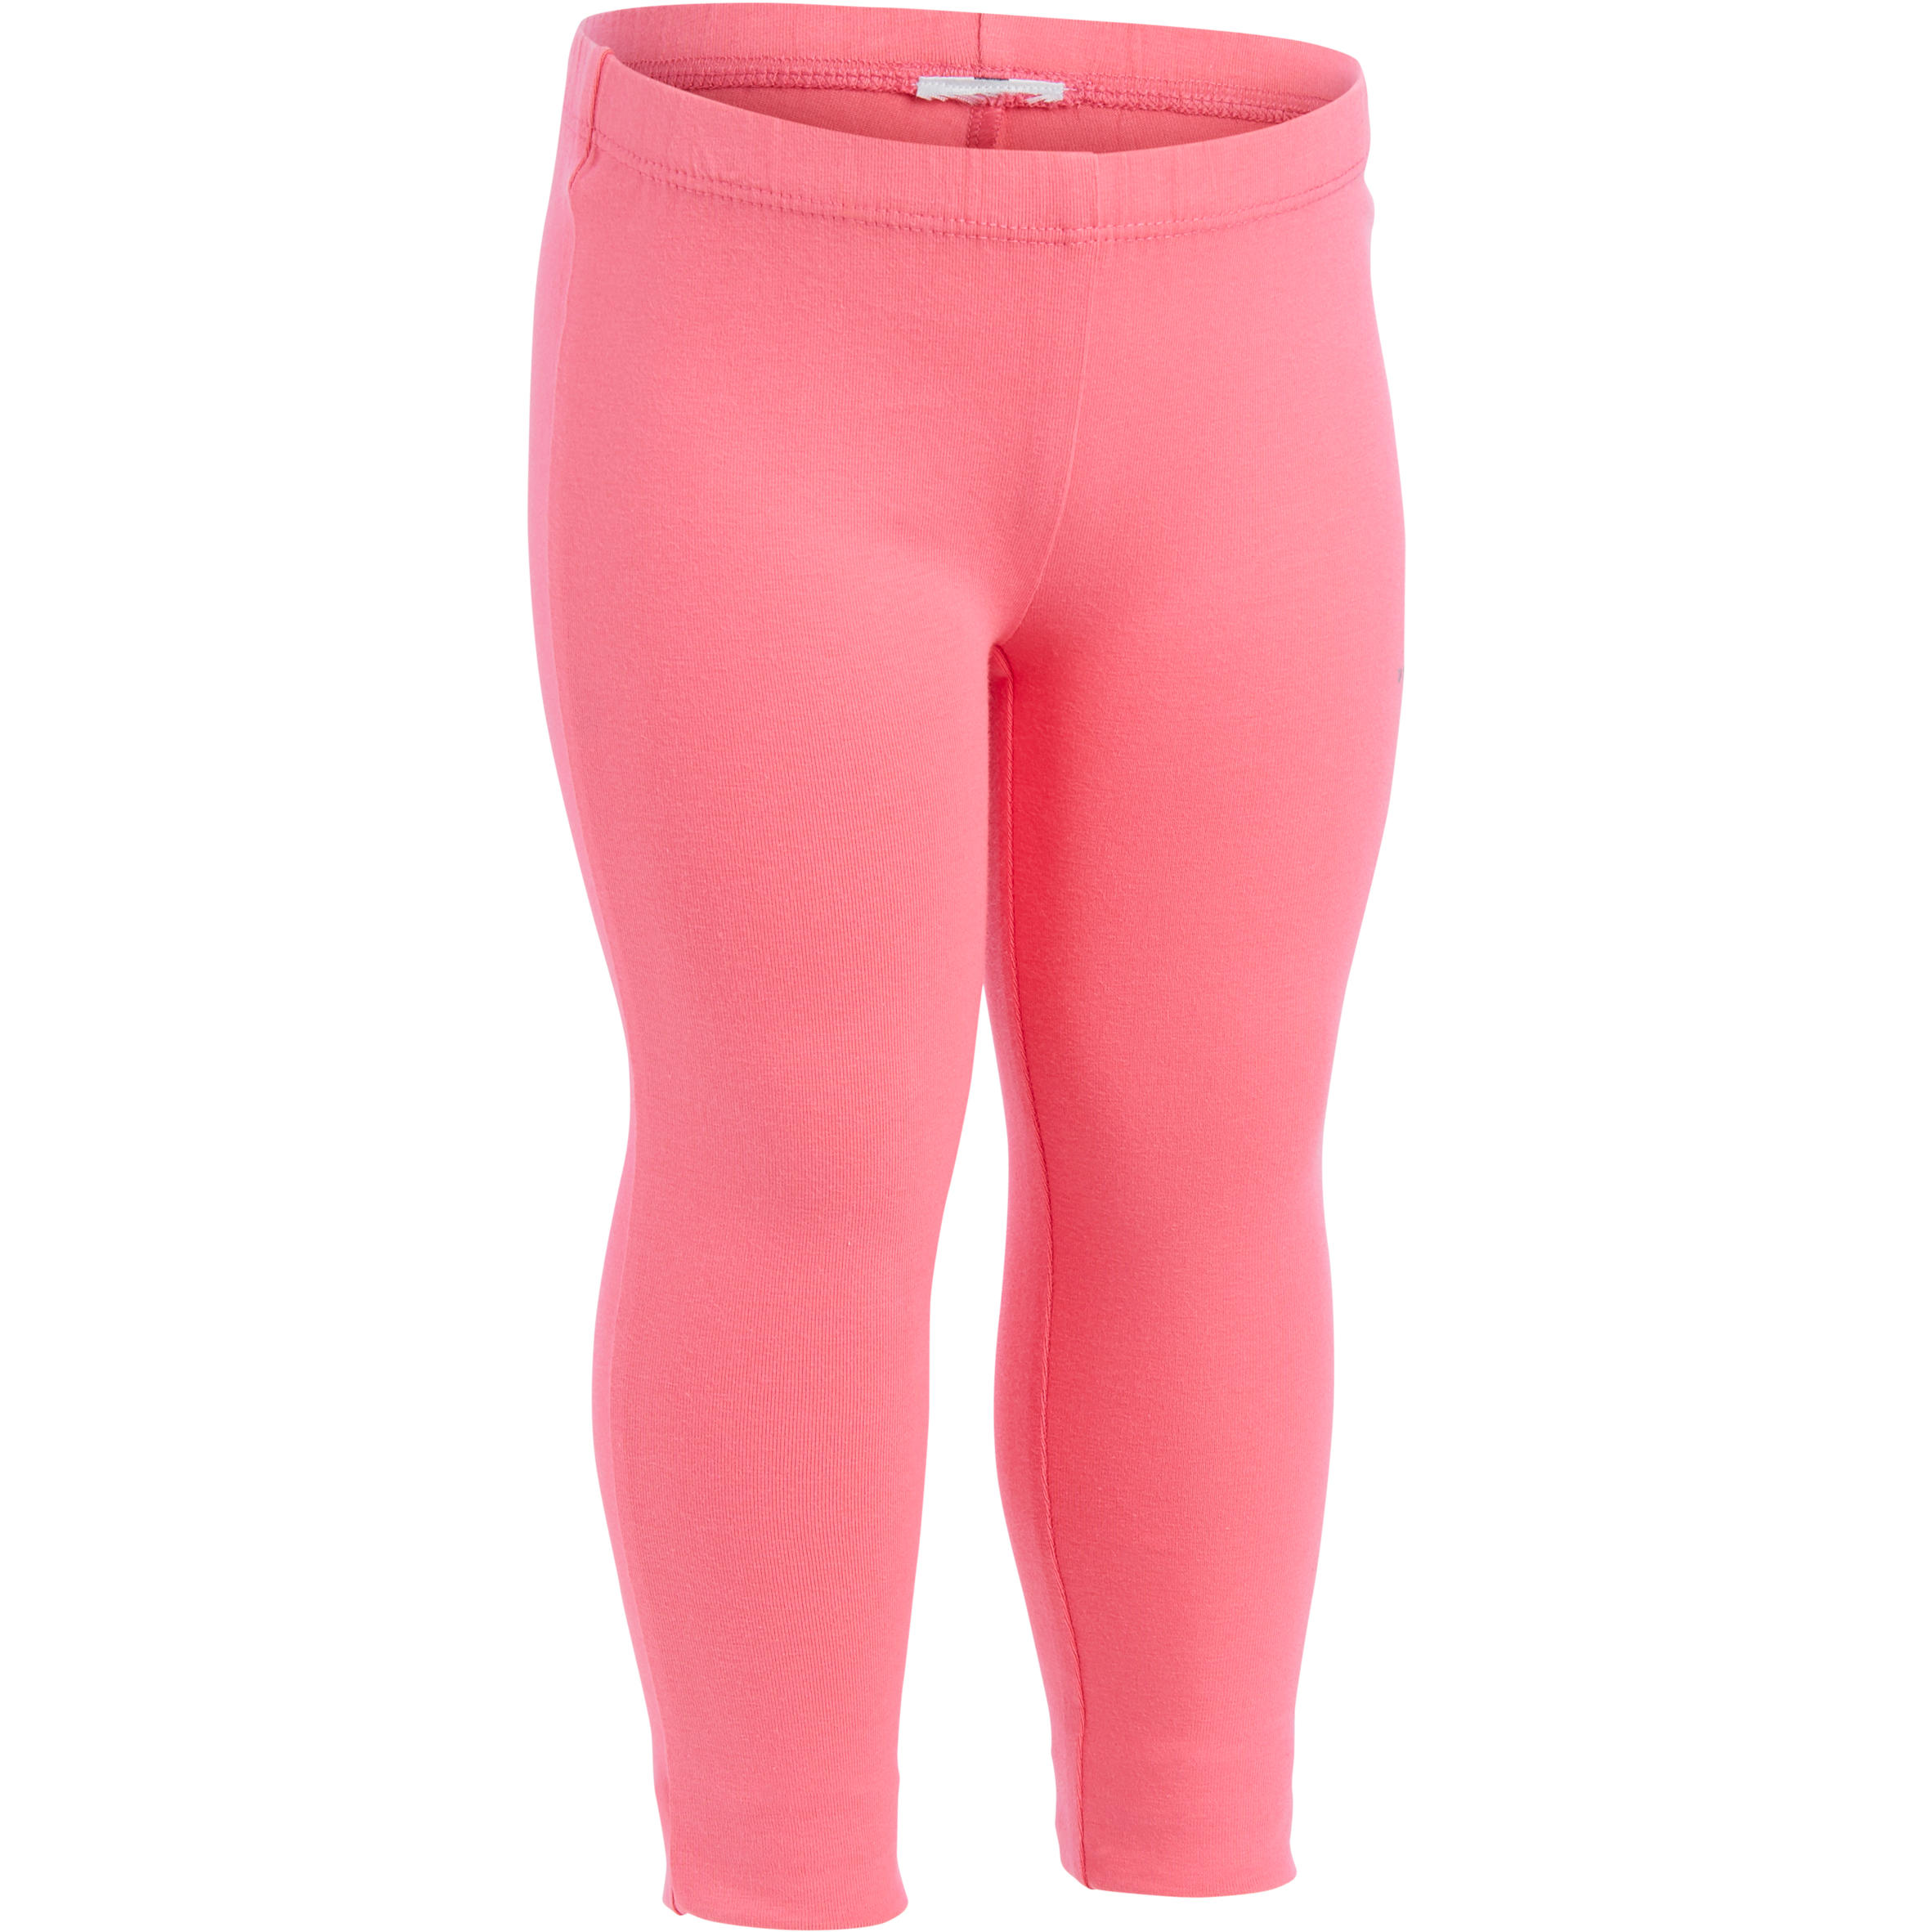 Pqt. x2 Leggings 500 gimnasia infantil estampado rosa